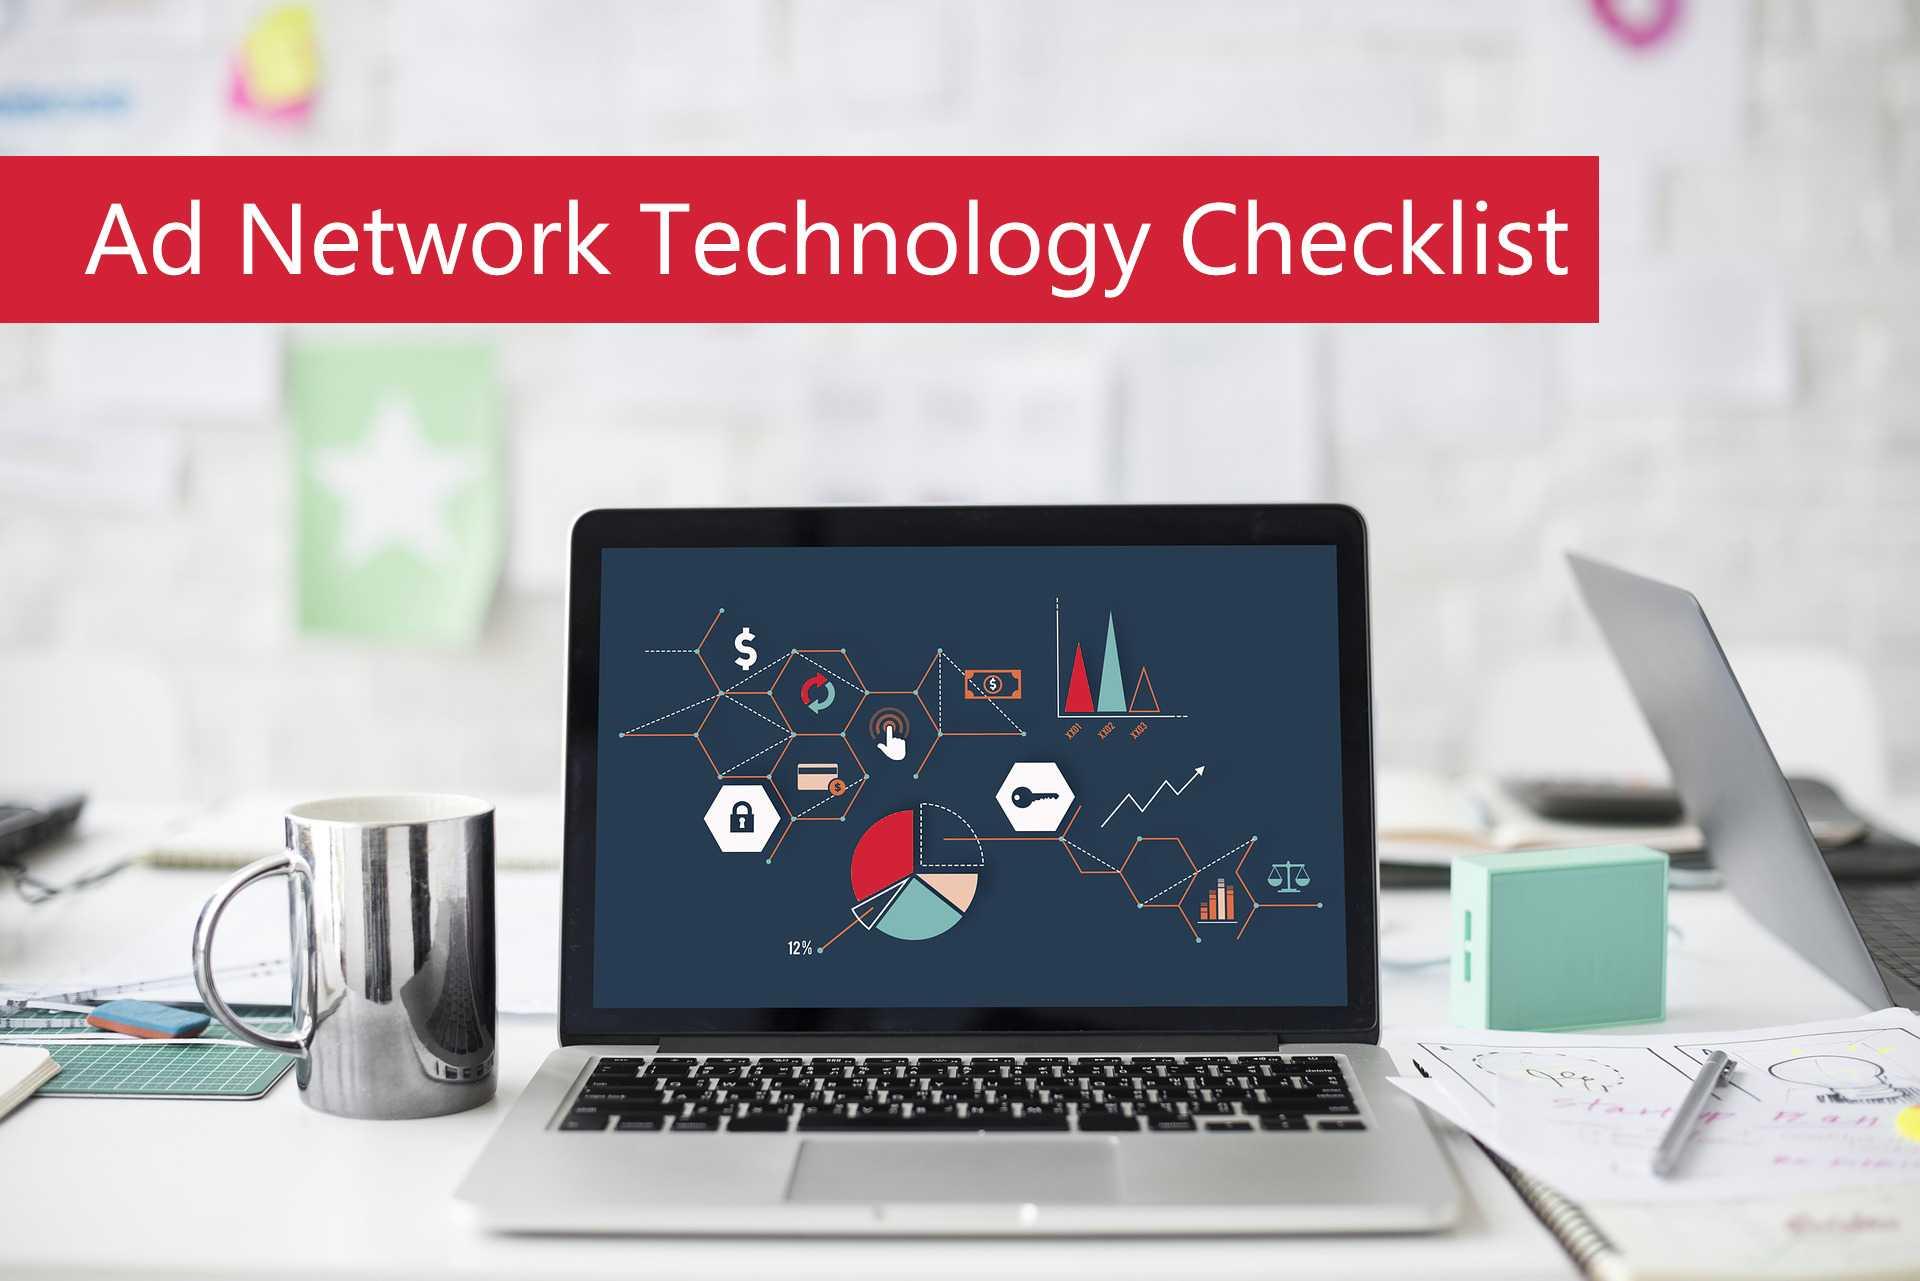 Ad Network Technology checklist